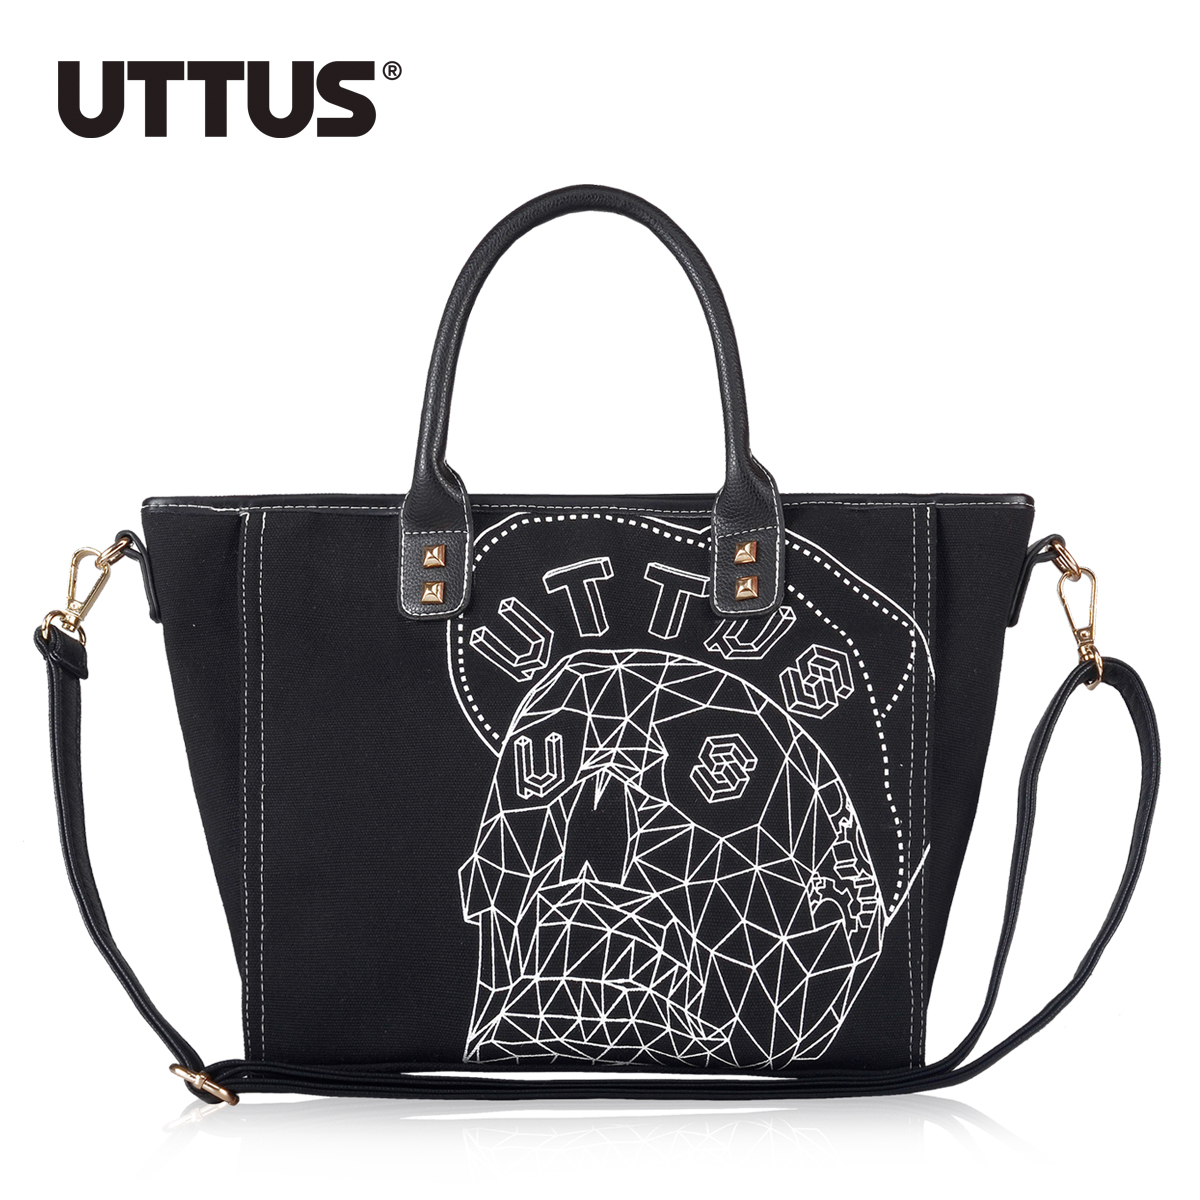 women messenger bags 2015 new handbag fashion casual canvas shoulder bag  skull print Messenger bag(China (Mainland))